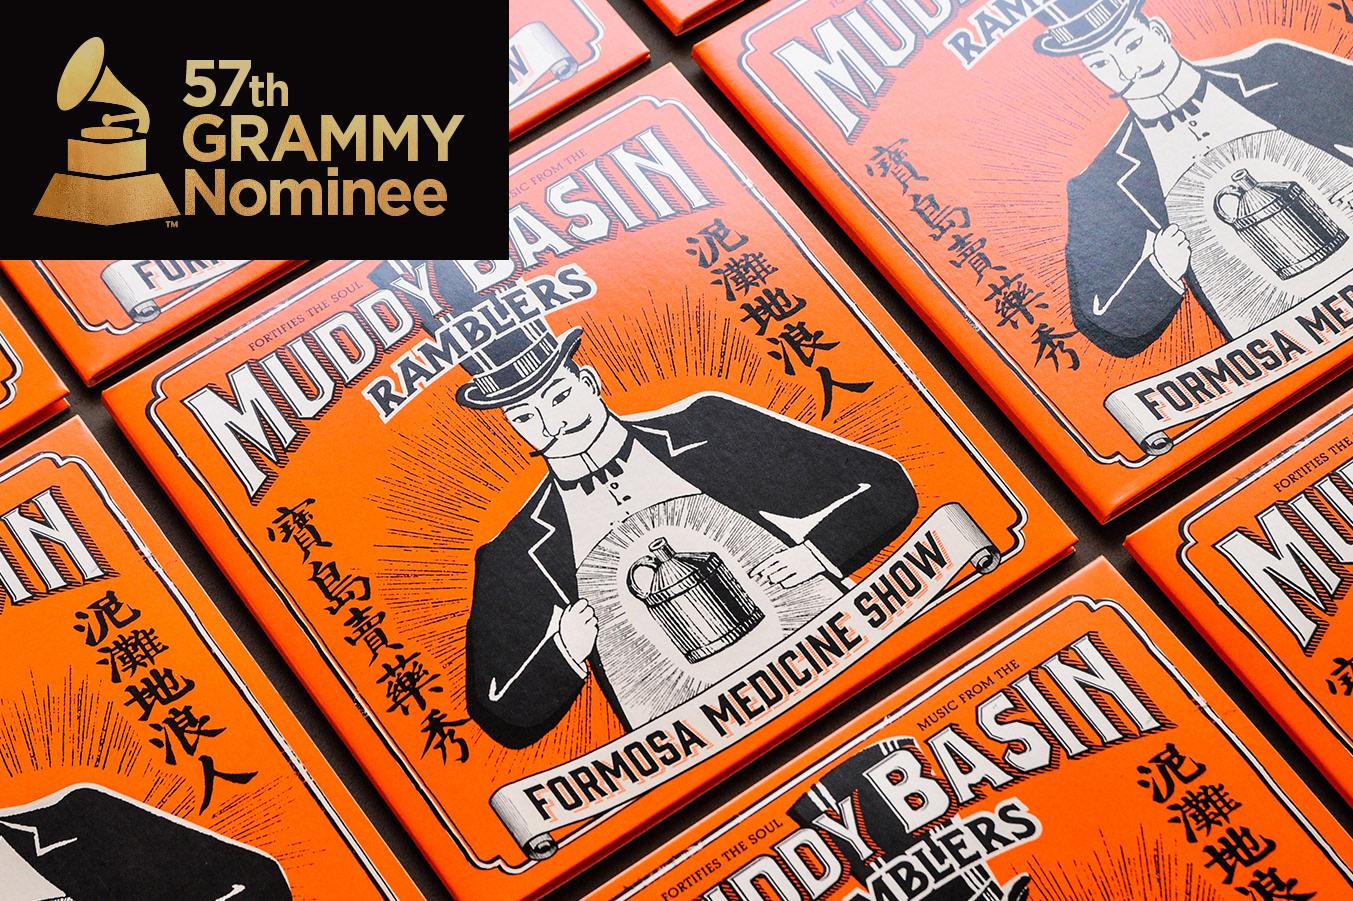 The Muddy Basin Ramblers - Formosa Medicine show CD